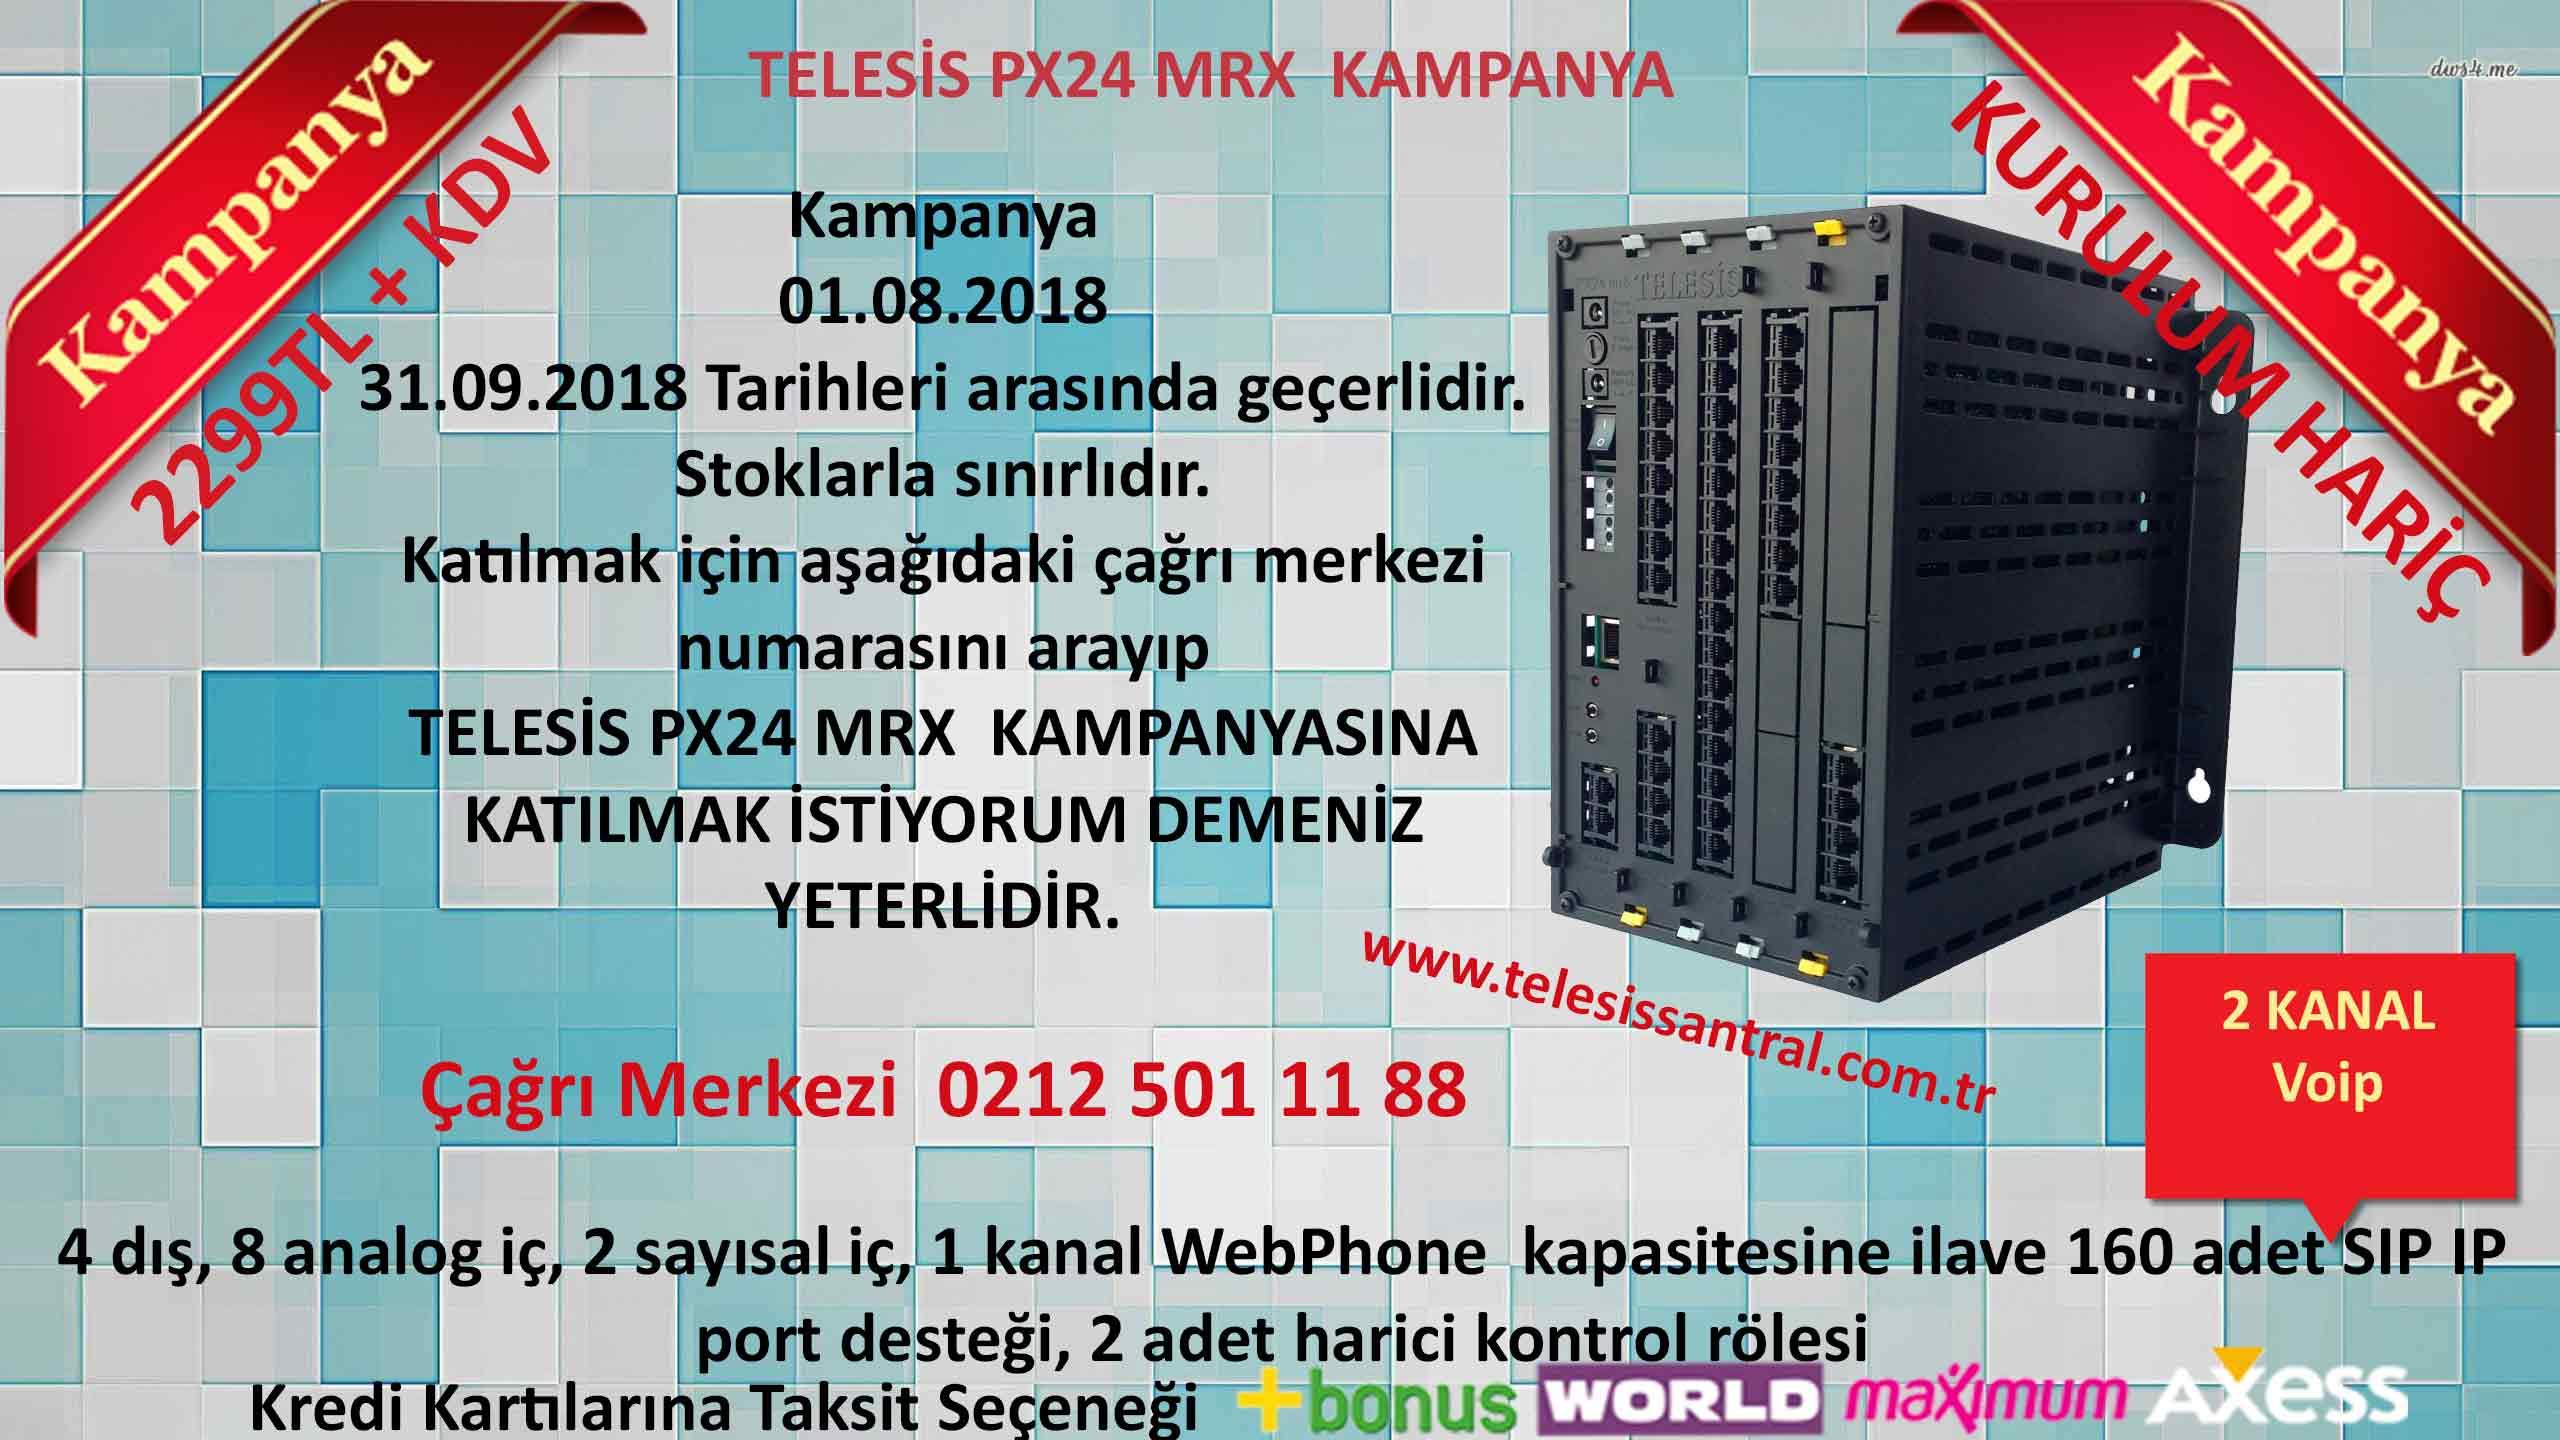 Telesis mr10  mrx kampanya